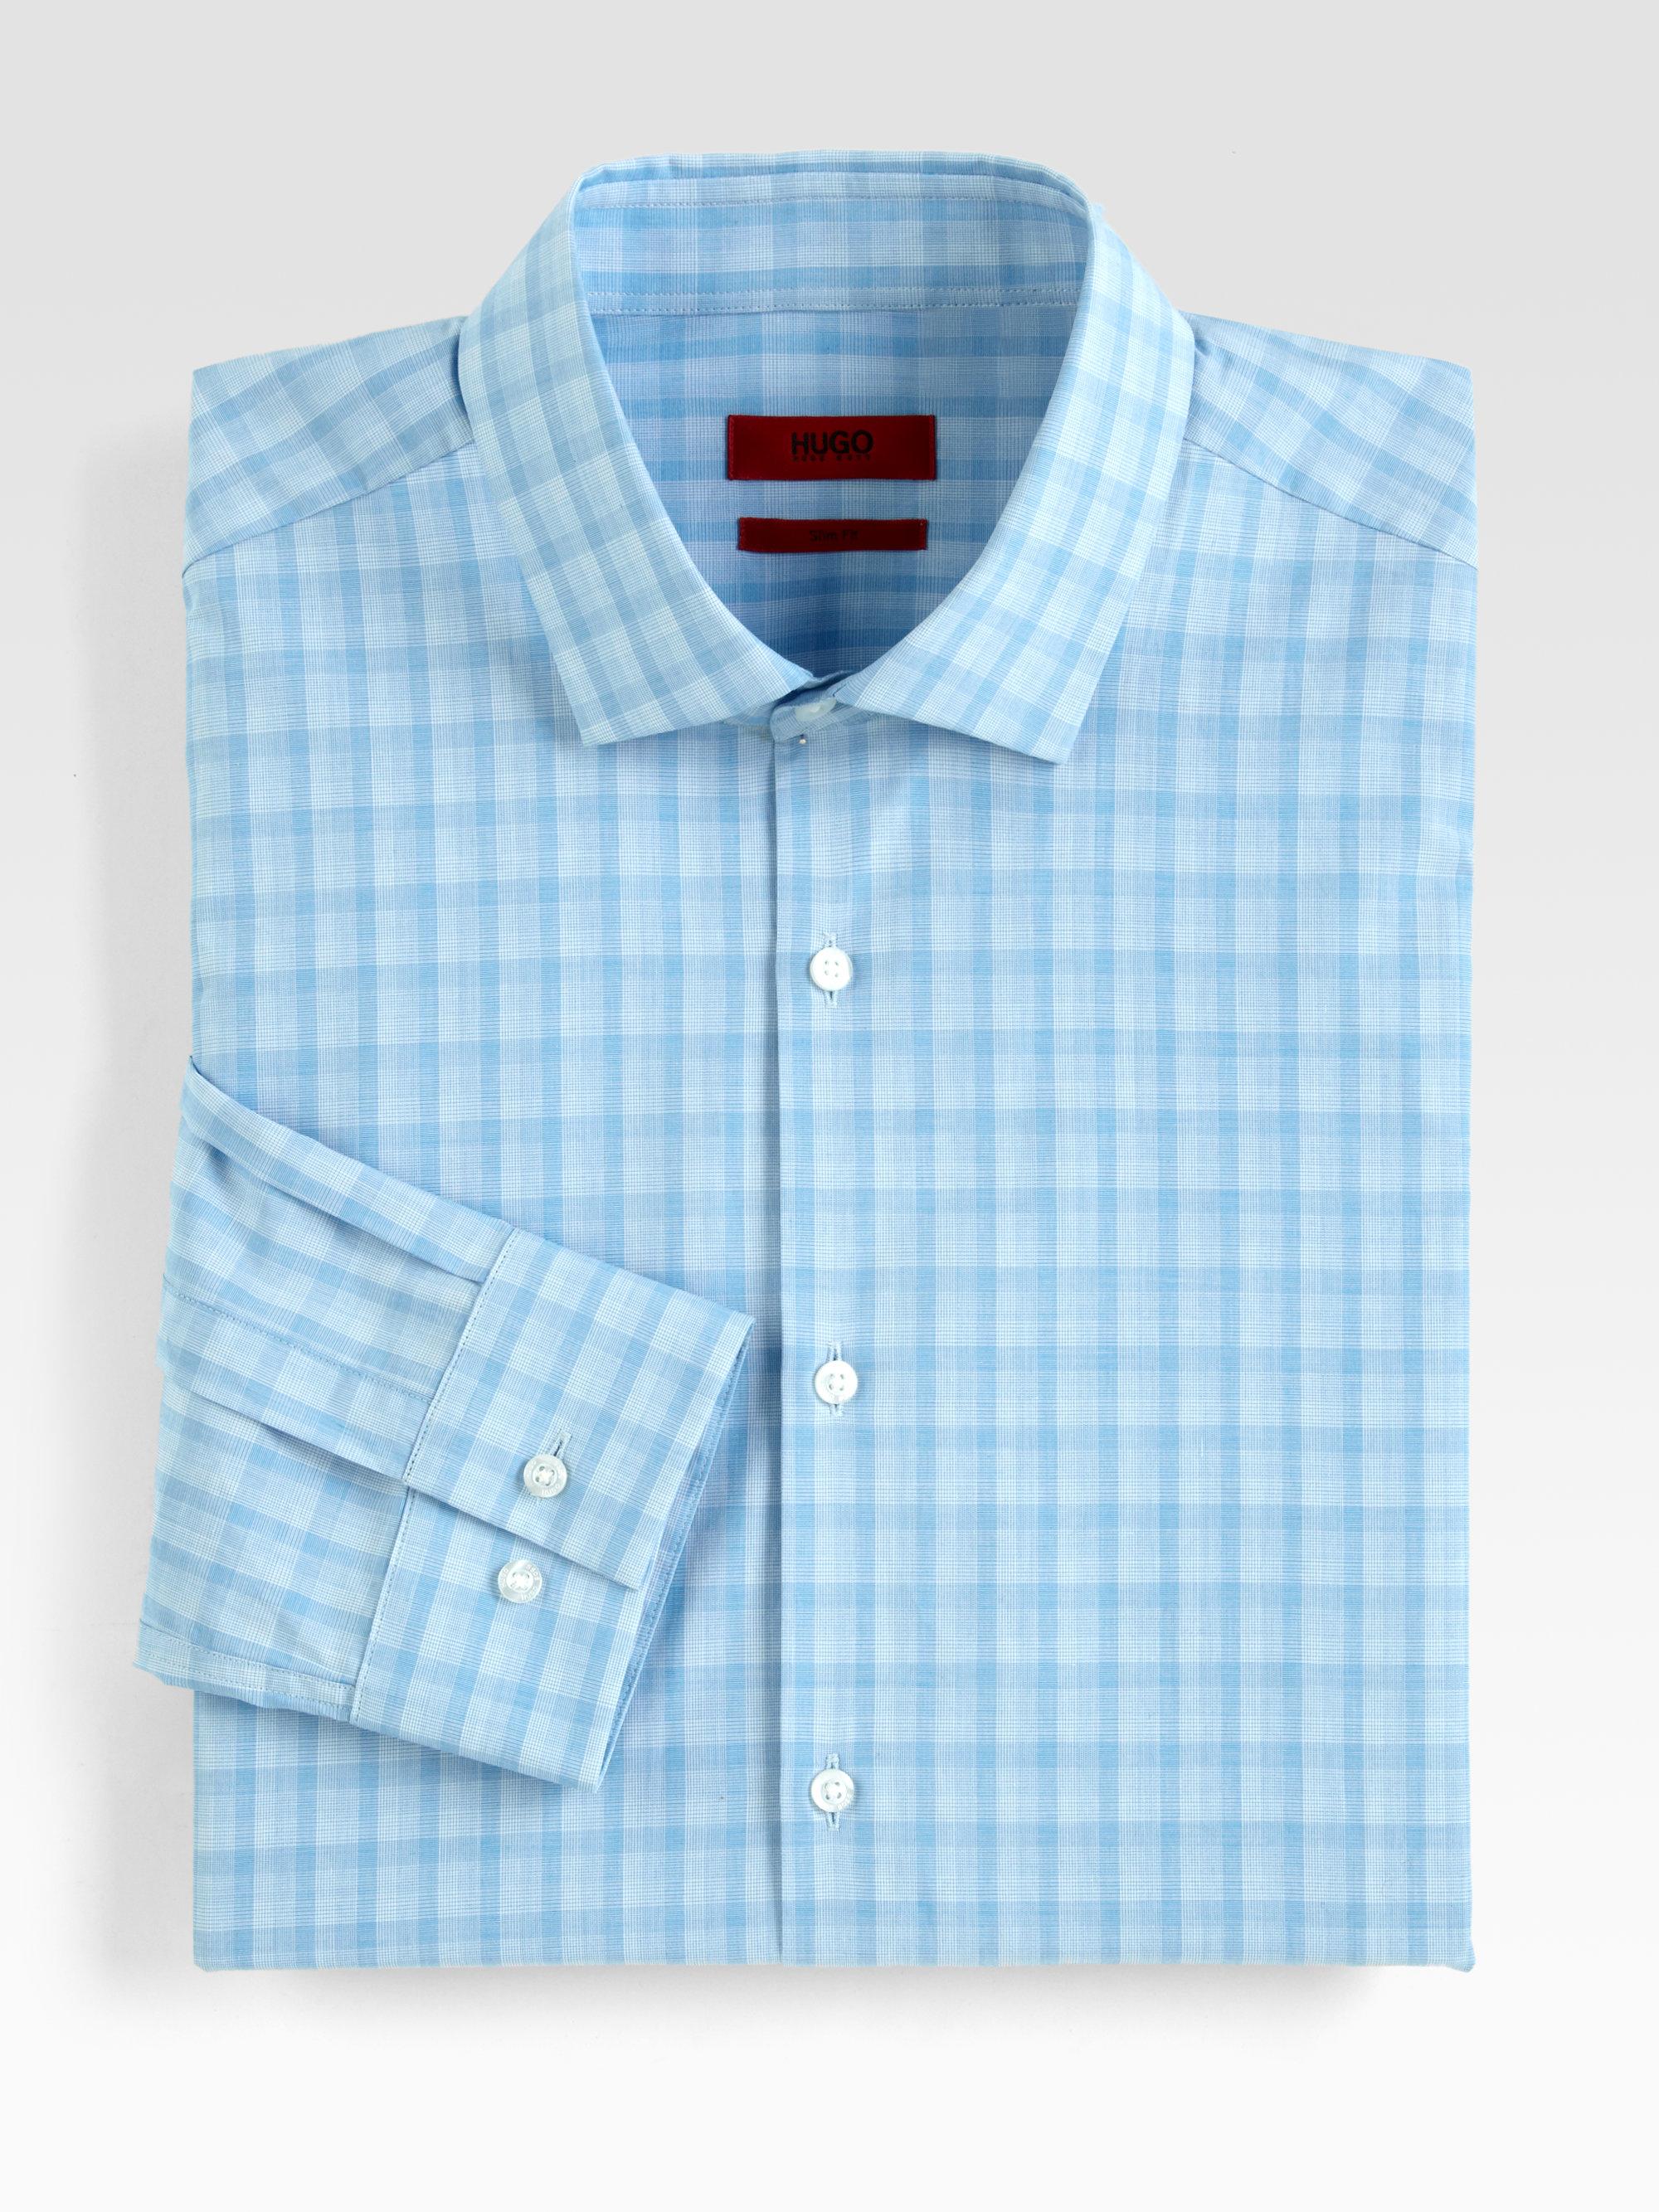 Hugo Tonal Check Dress Shirt In Blue For Men Aqua Navy